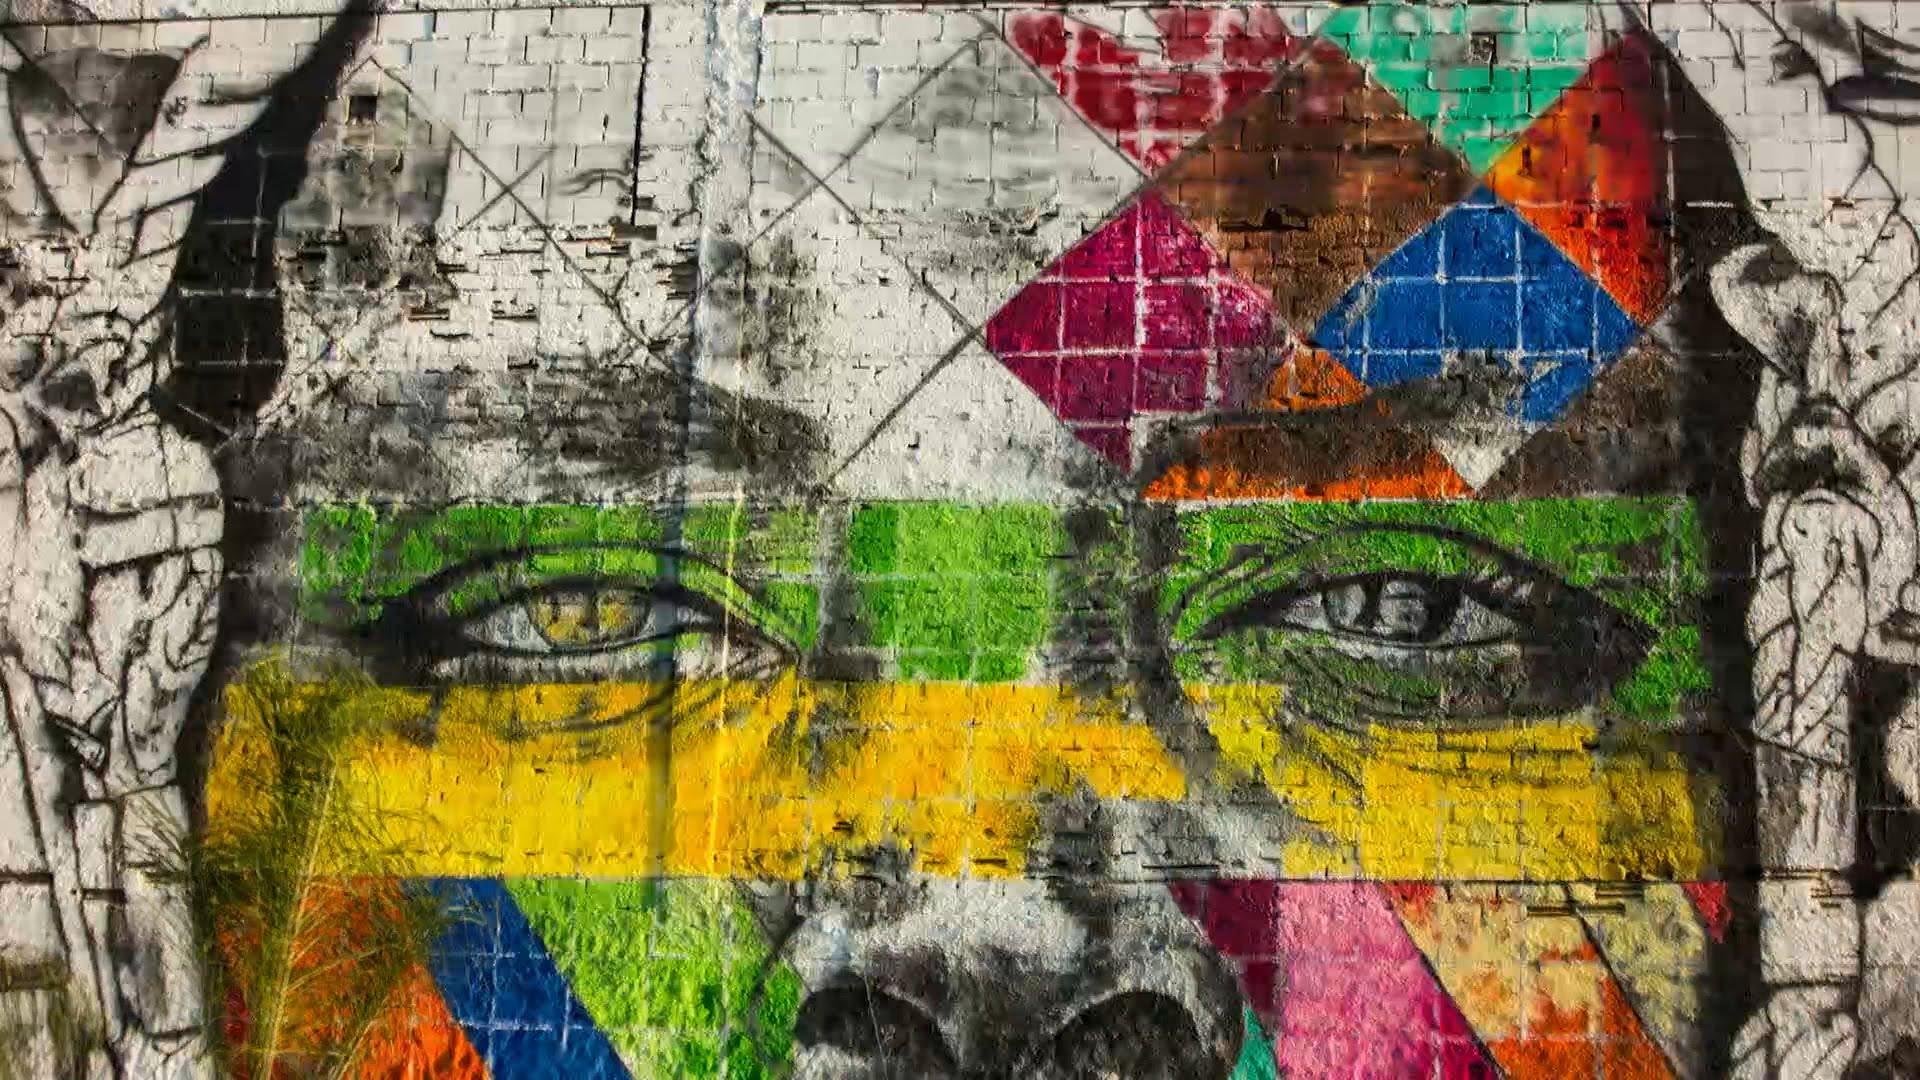 VIDEO: GRAFFITI Eduardo Kobra i njegov fantastični uradak 'Etnias'